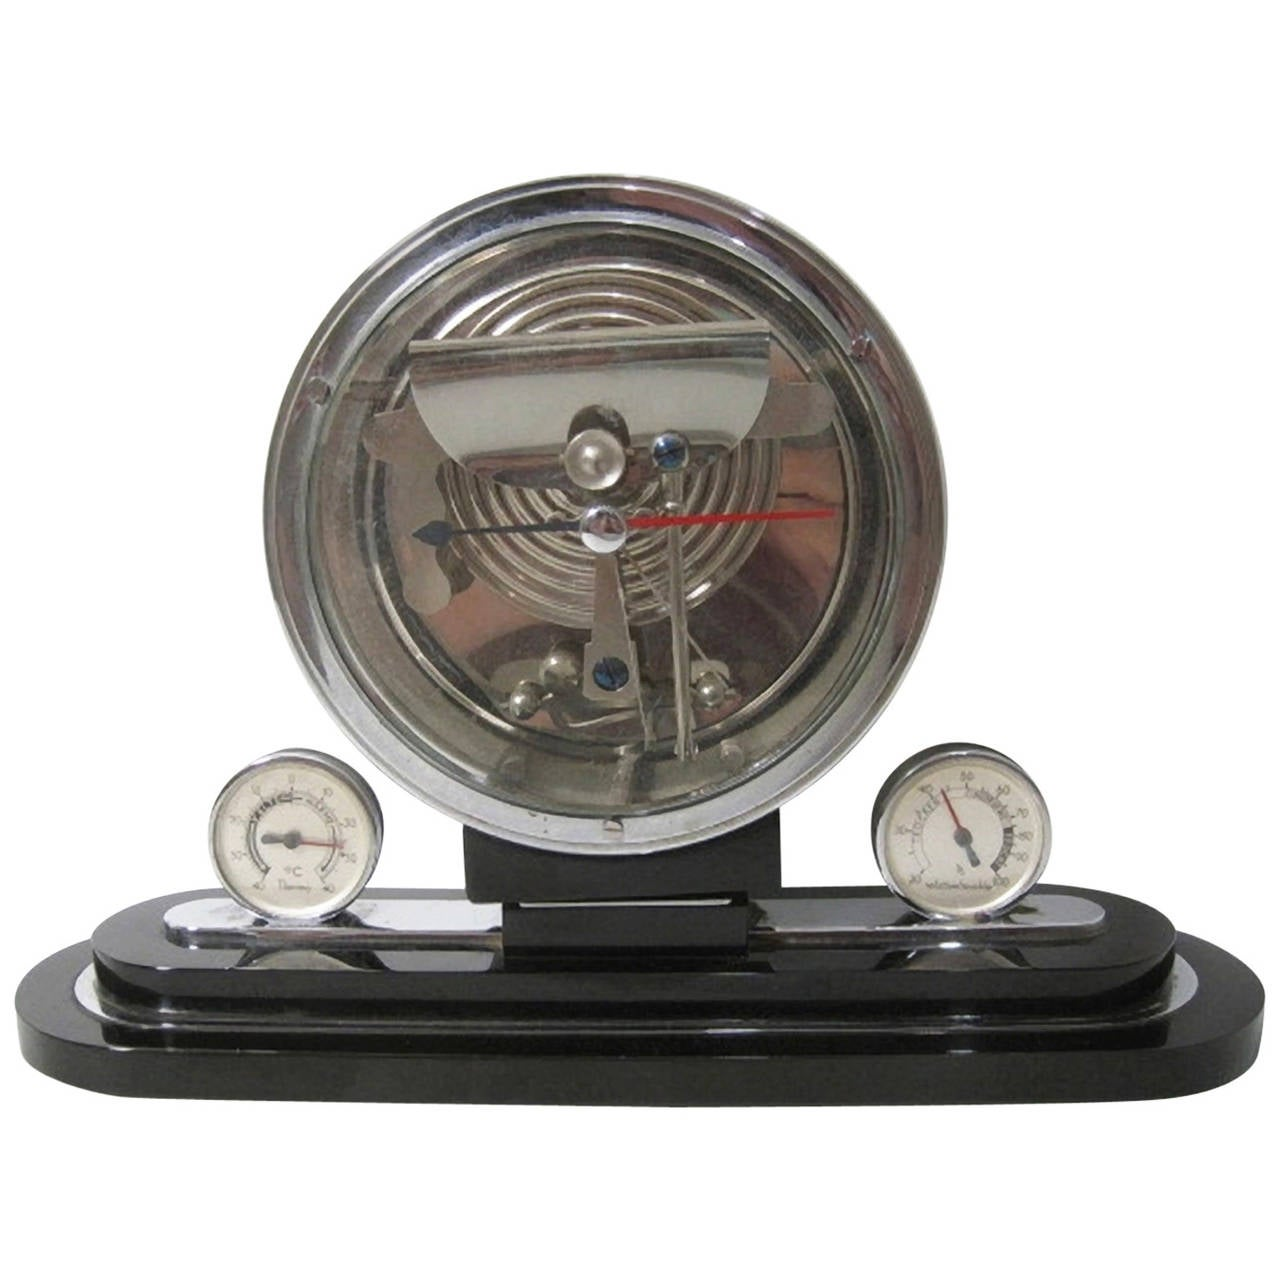 German Art Deco Desk Top Barometer and Weather Station